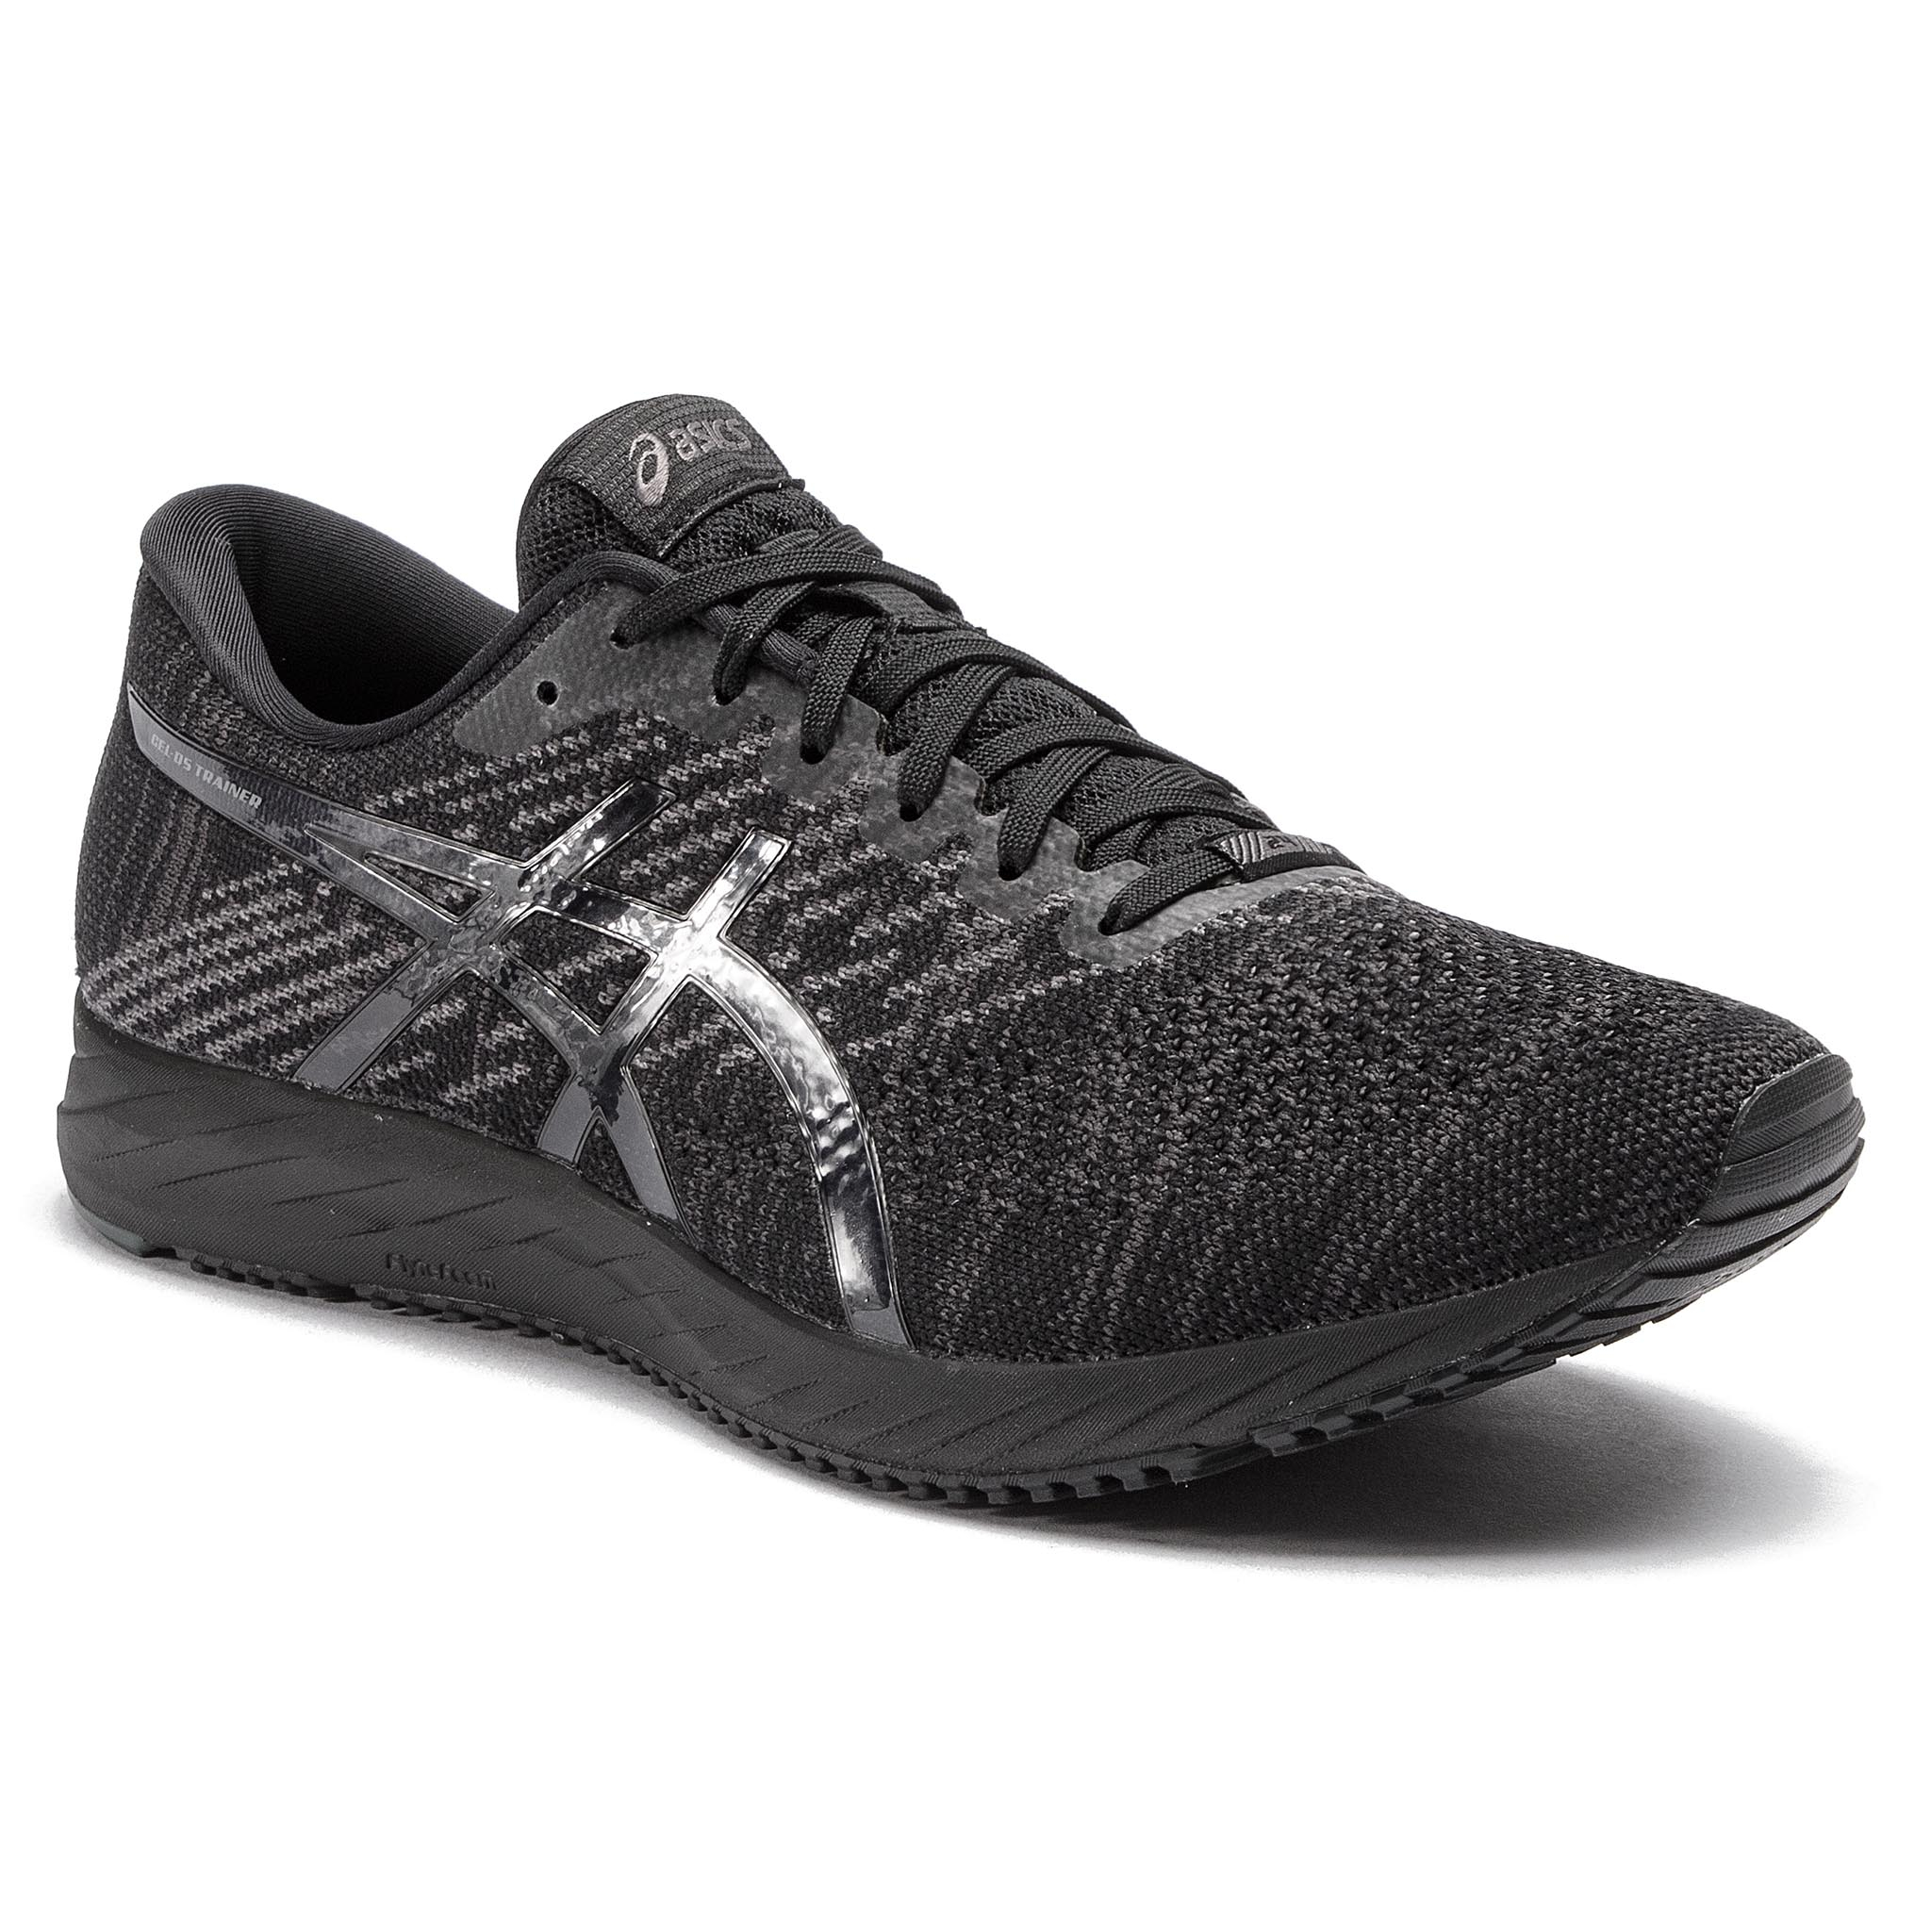 Whitepitaya Gsm 102 Asics Onitsuka 1182a076 Sneakers Tiger 8yOv0mNnw